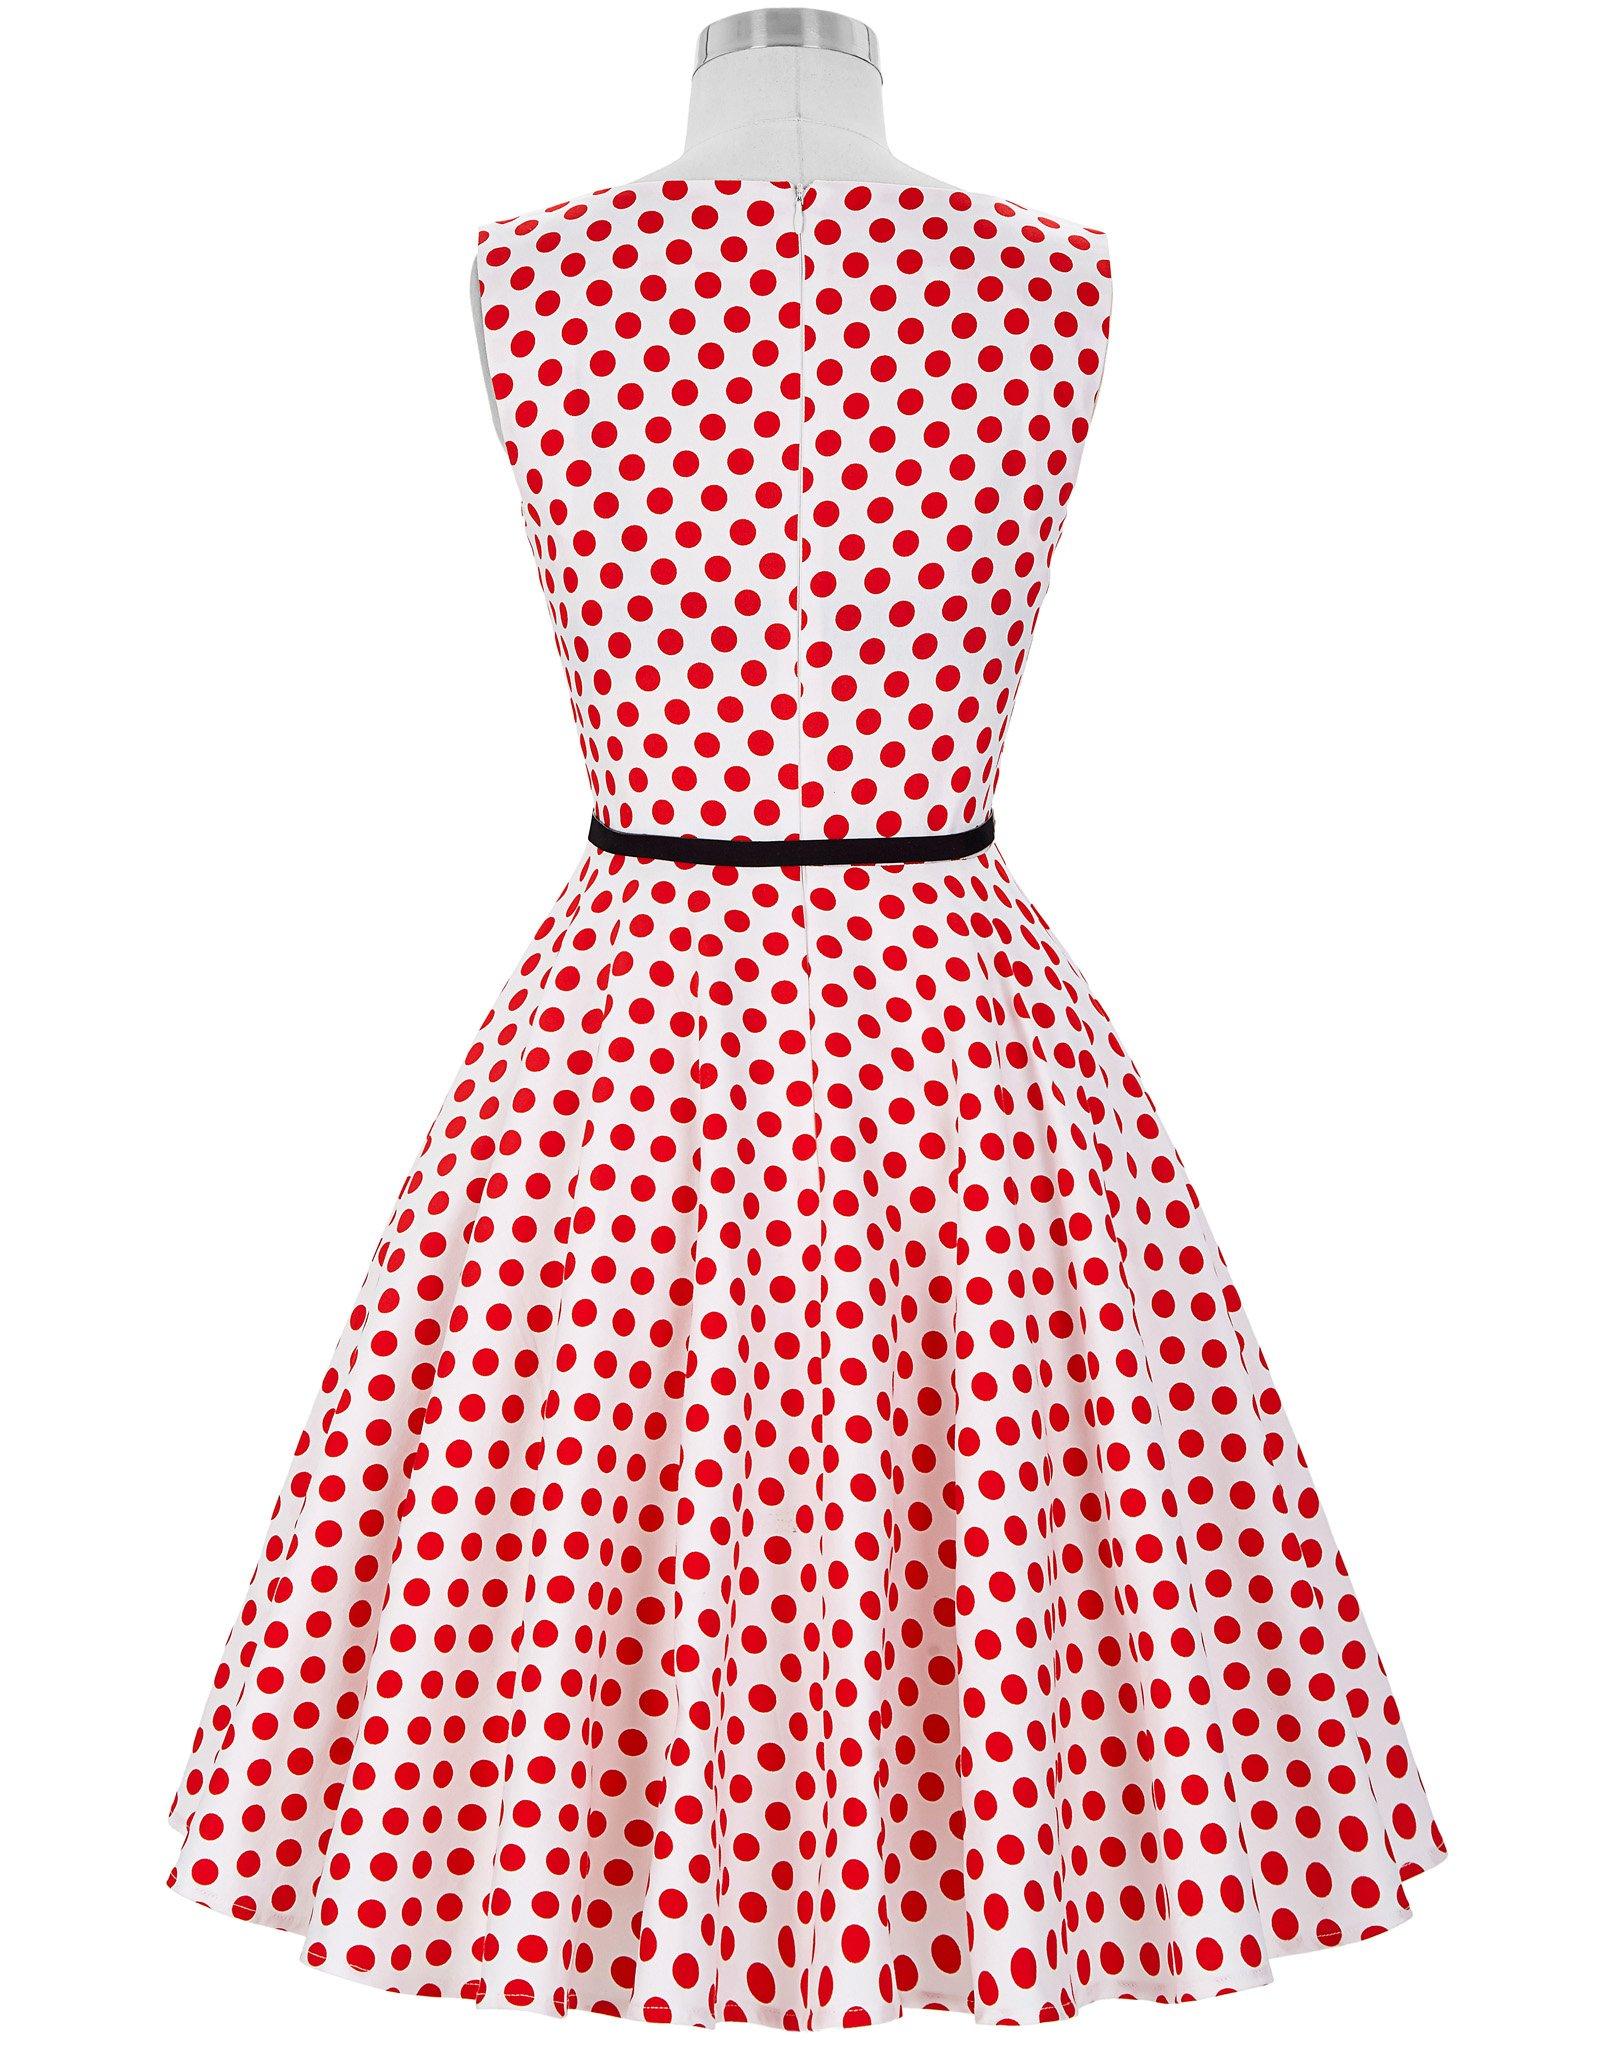 0bb235716c0b Galleon - Women Retro 50s Swing Dress Sleeveless Size 2XL F-44